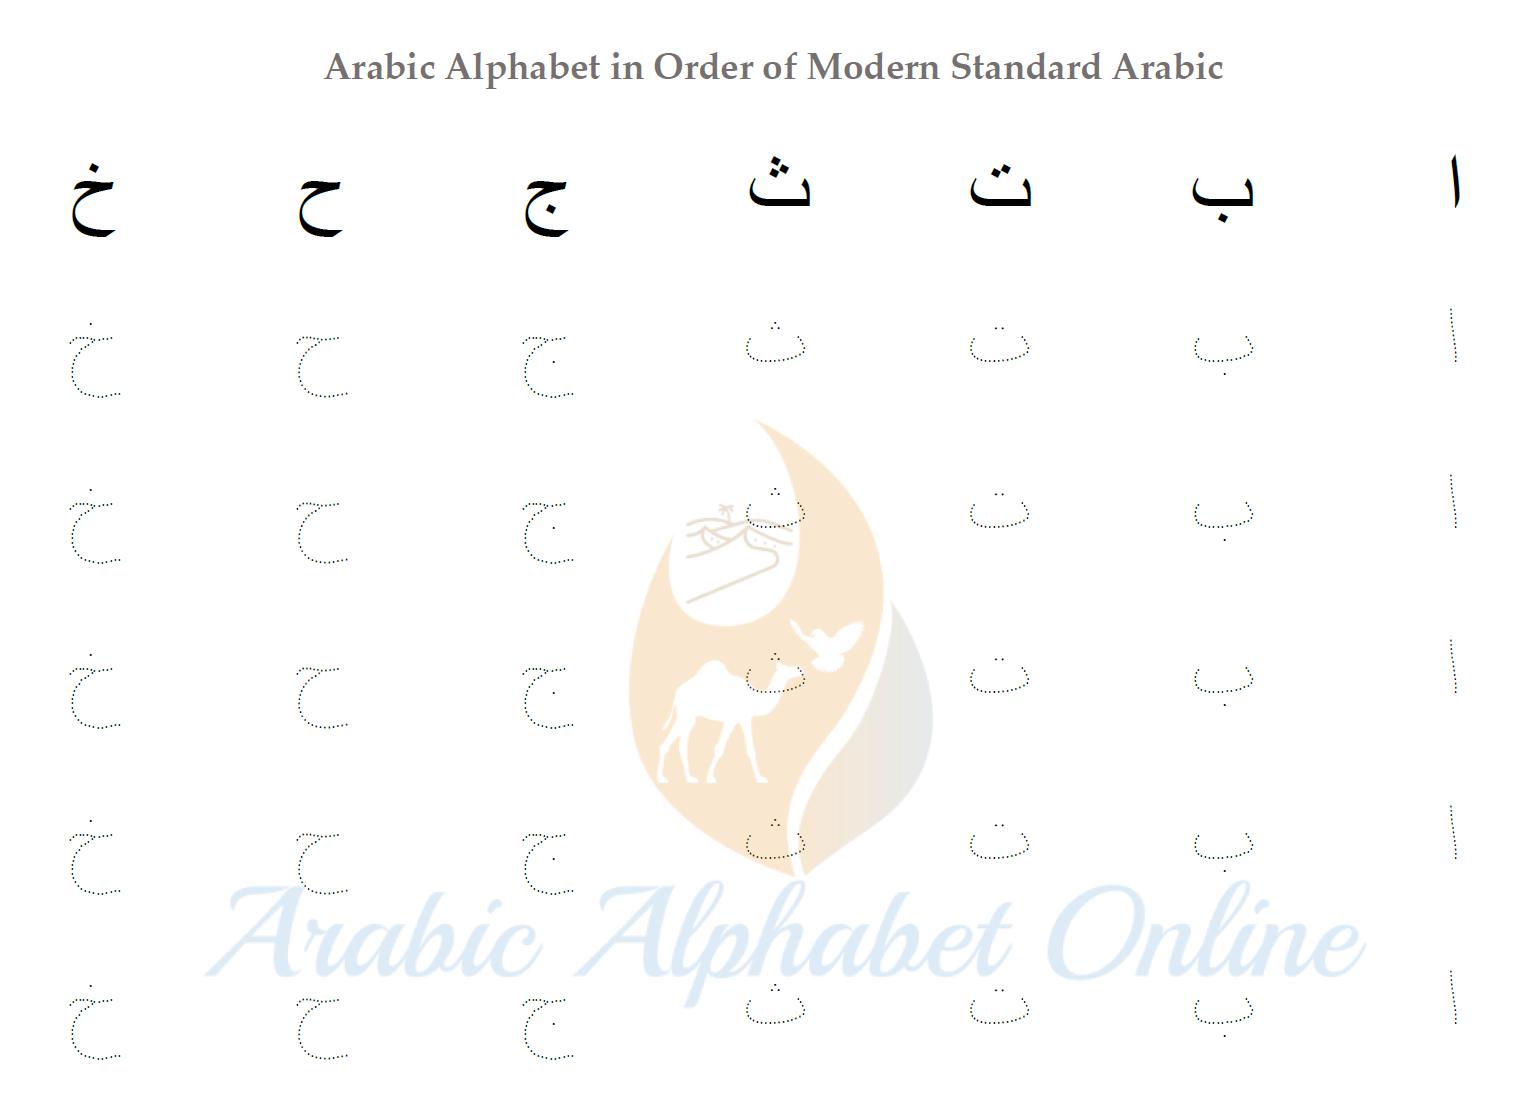 Arabic Alphabet Tracing Worksheets | Arabic Alphabet Online with Arabic Letters Tracing Worksheets